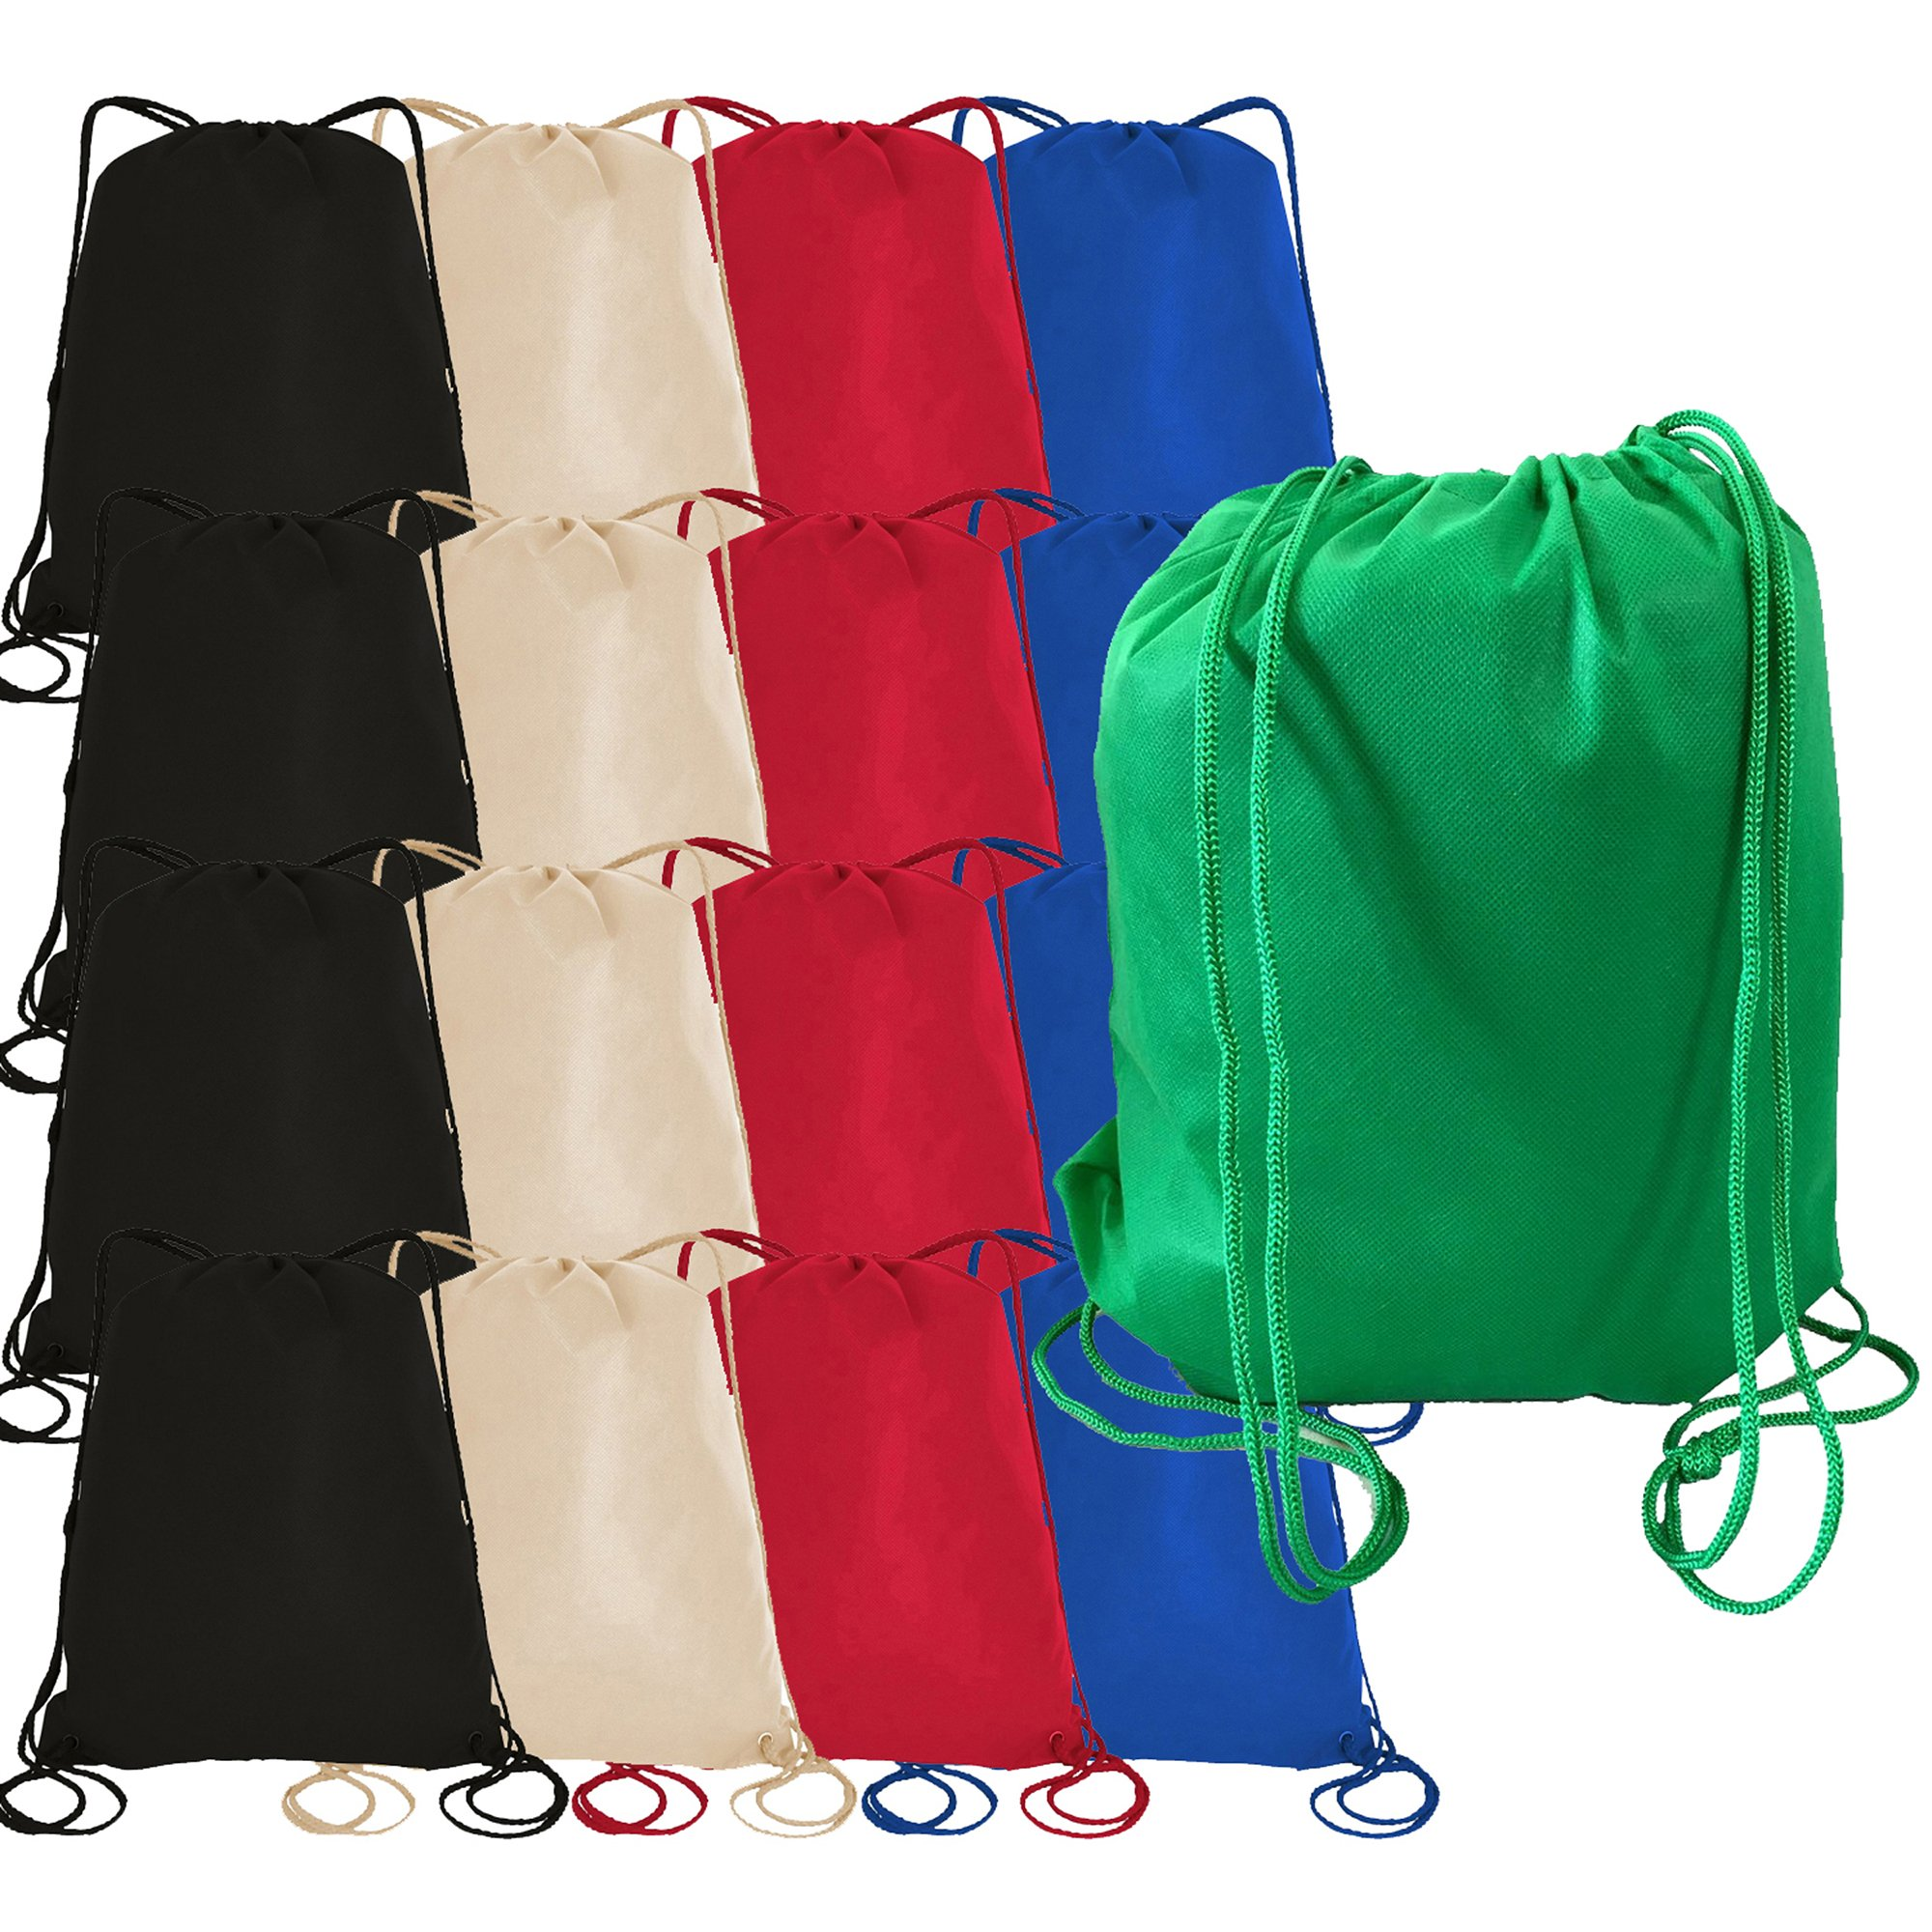 50 Pieces Bulk 100gm Non-Woven Polypropylene Drawstring Bag, Cinch Sack, Gift Bag, Sack Bag (ASSORTED-MIX)